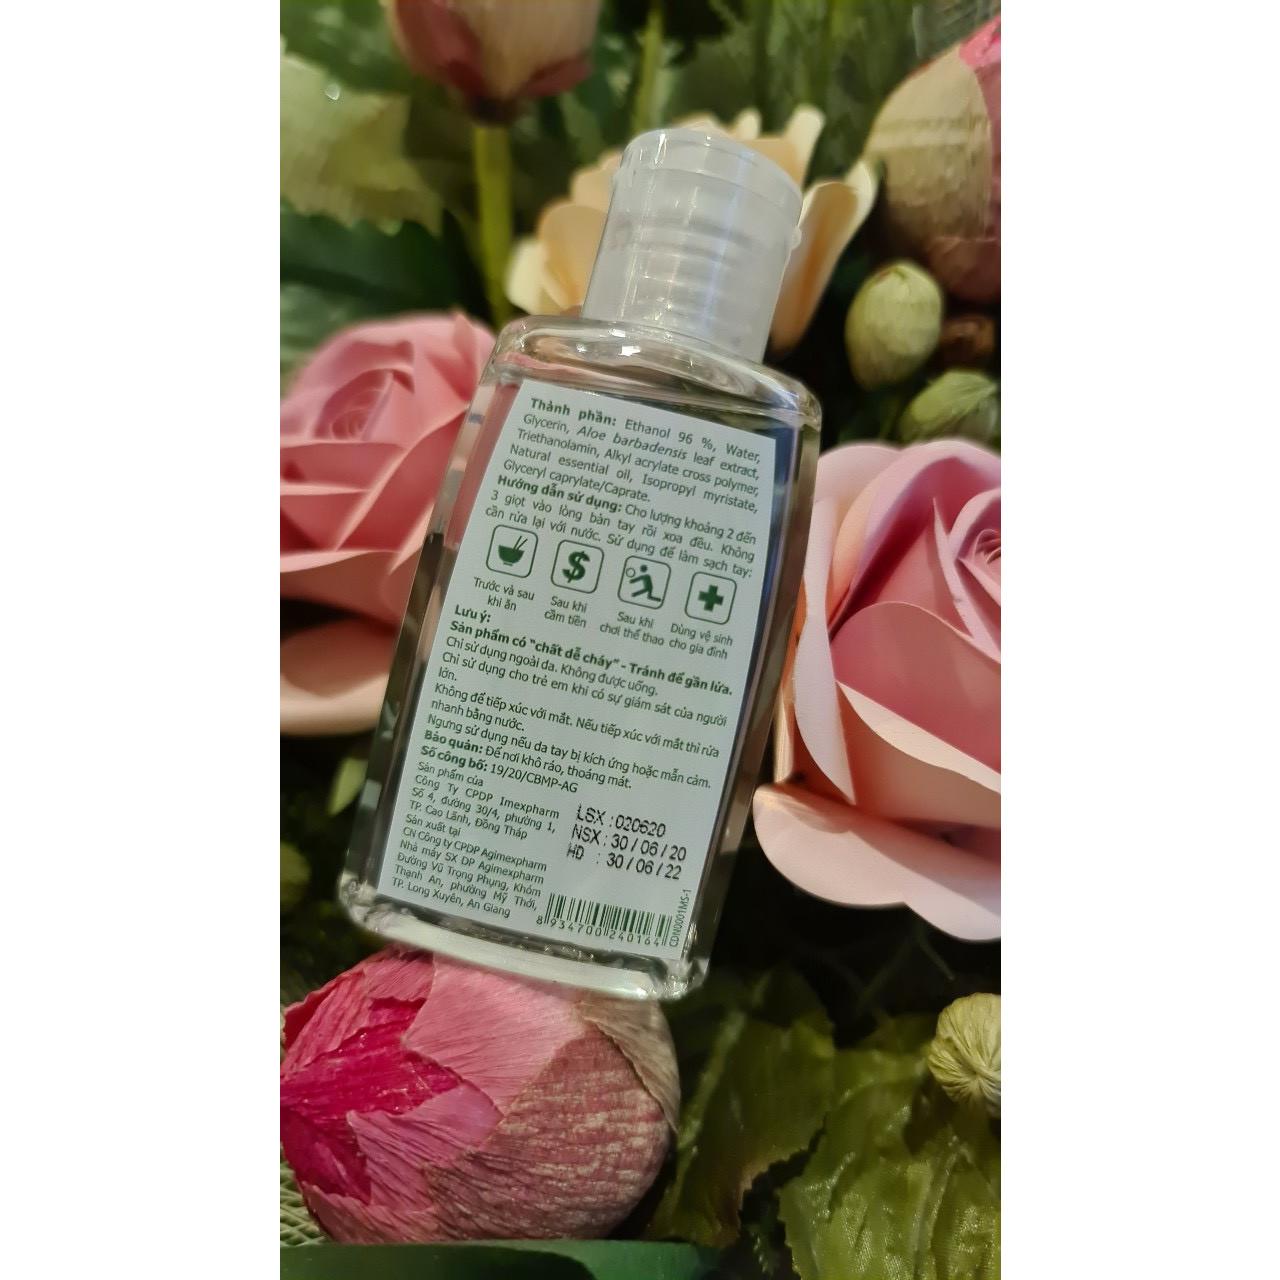 IMEXPURE 60ml - Gel rửa tay sát khuẩn hiệu quả của IMEXPHARM